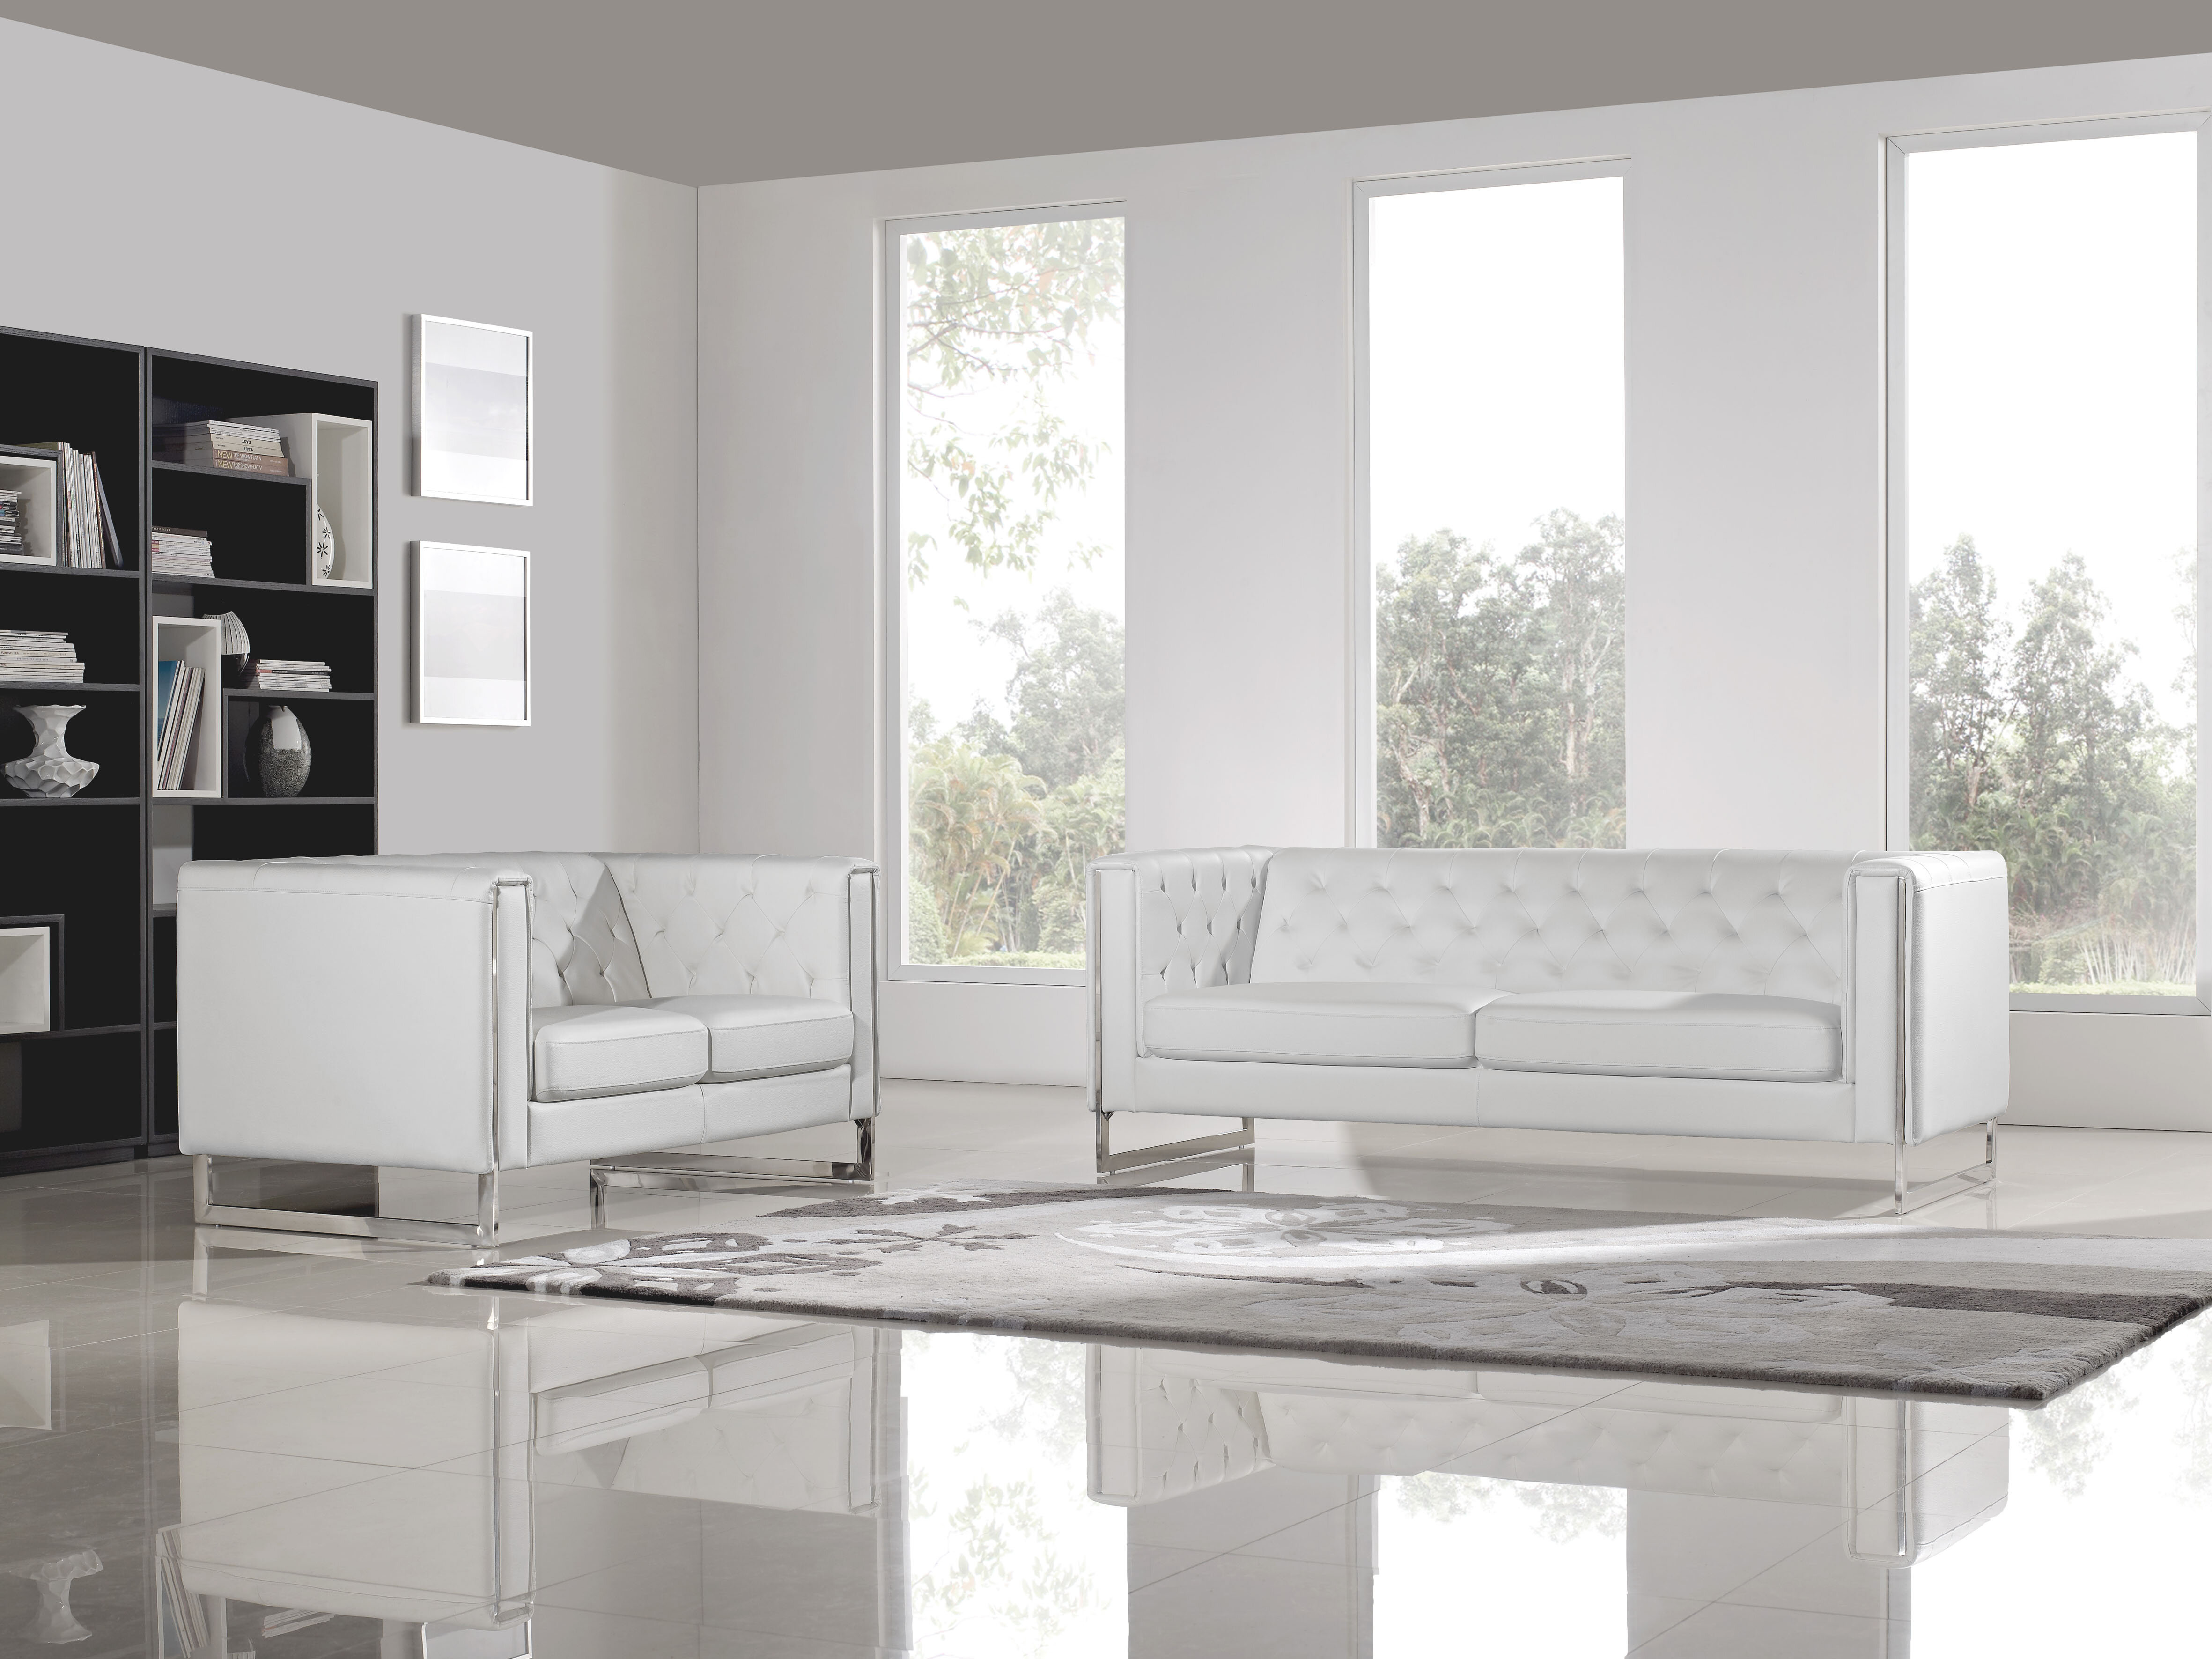 Diamond Sofa Chelsea Configurable Living Room Set & Reviews | Wayfair